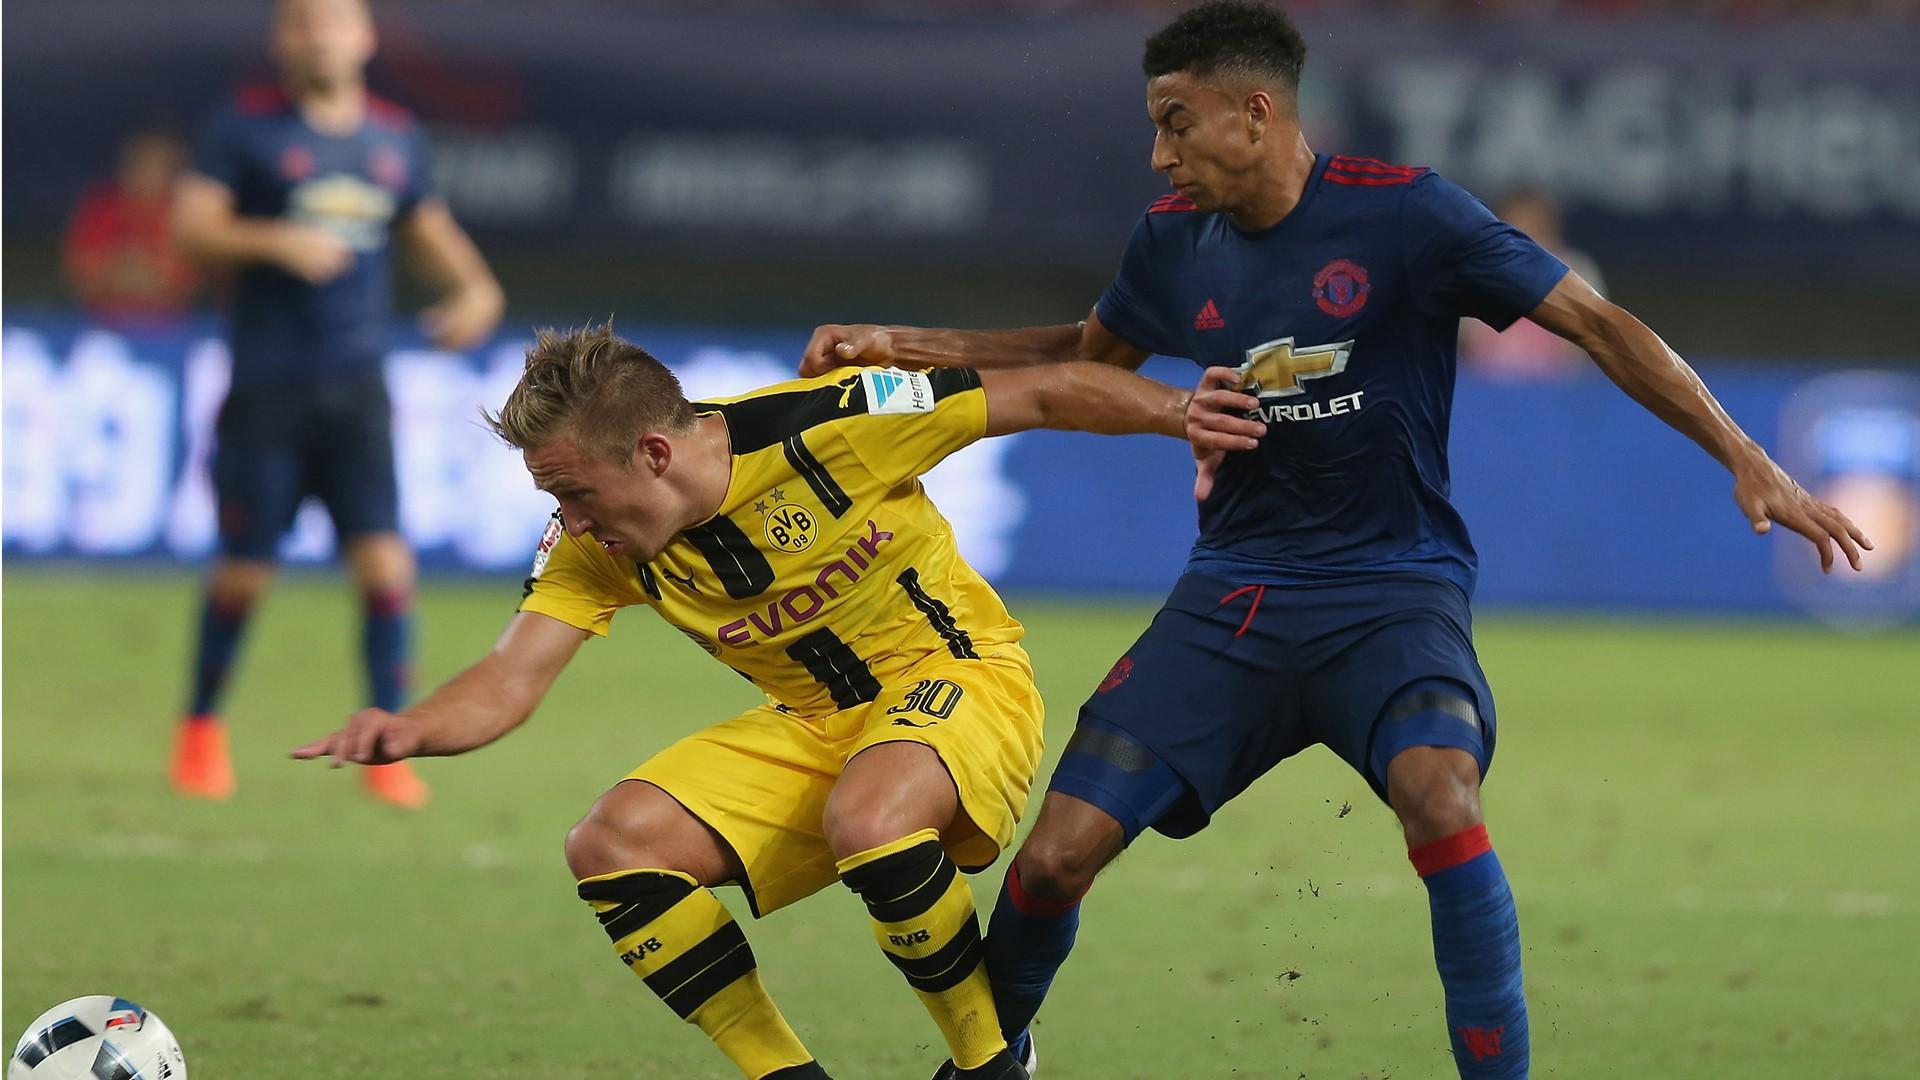 Borussia Dortmund Wallpapers 3